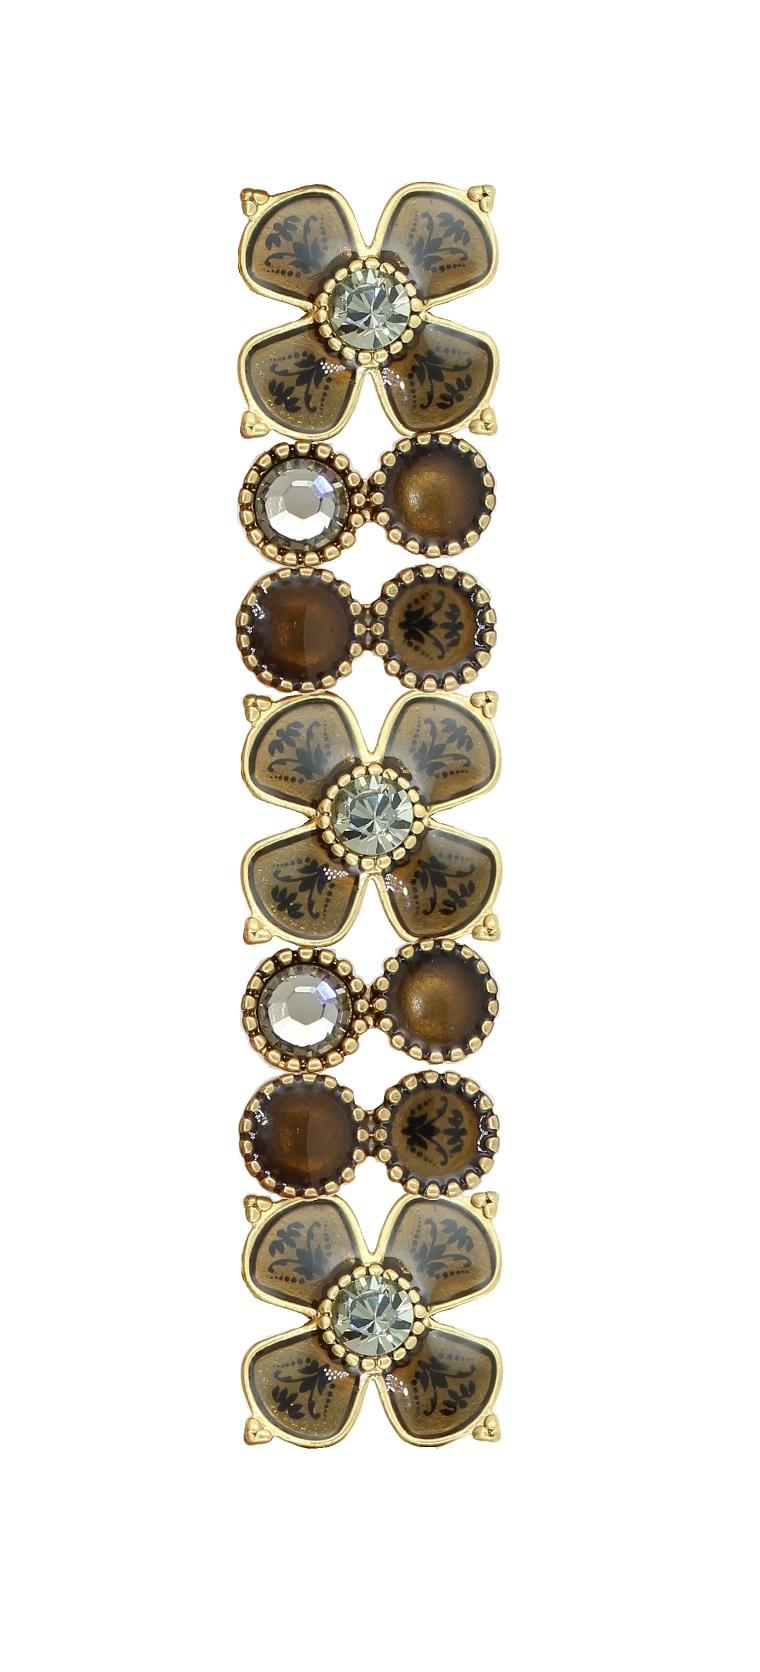 PILGRIM - Devotion Flower Panel Stretch Bracelet, Taupe Enamel & Grey Crystal, Gold Plate BNWT